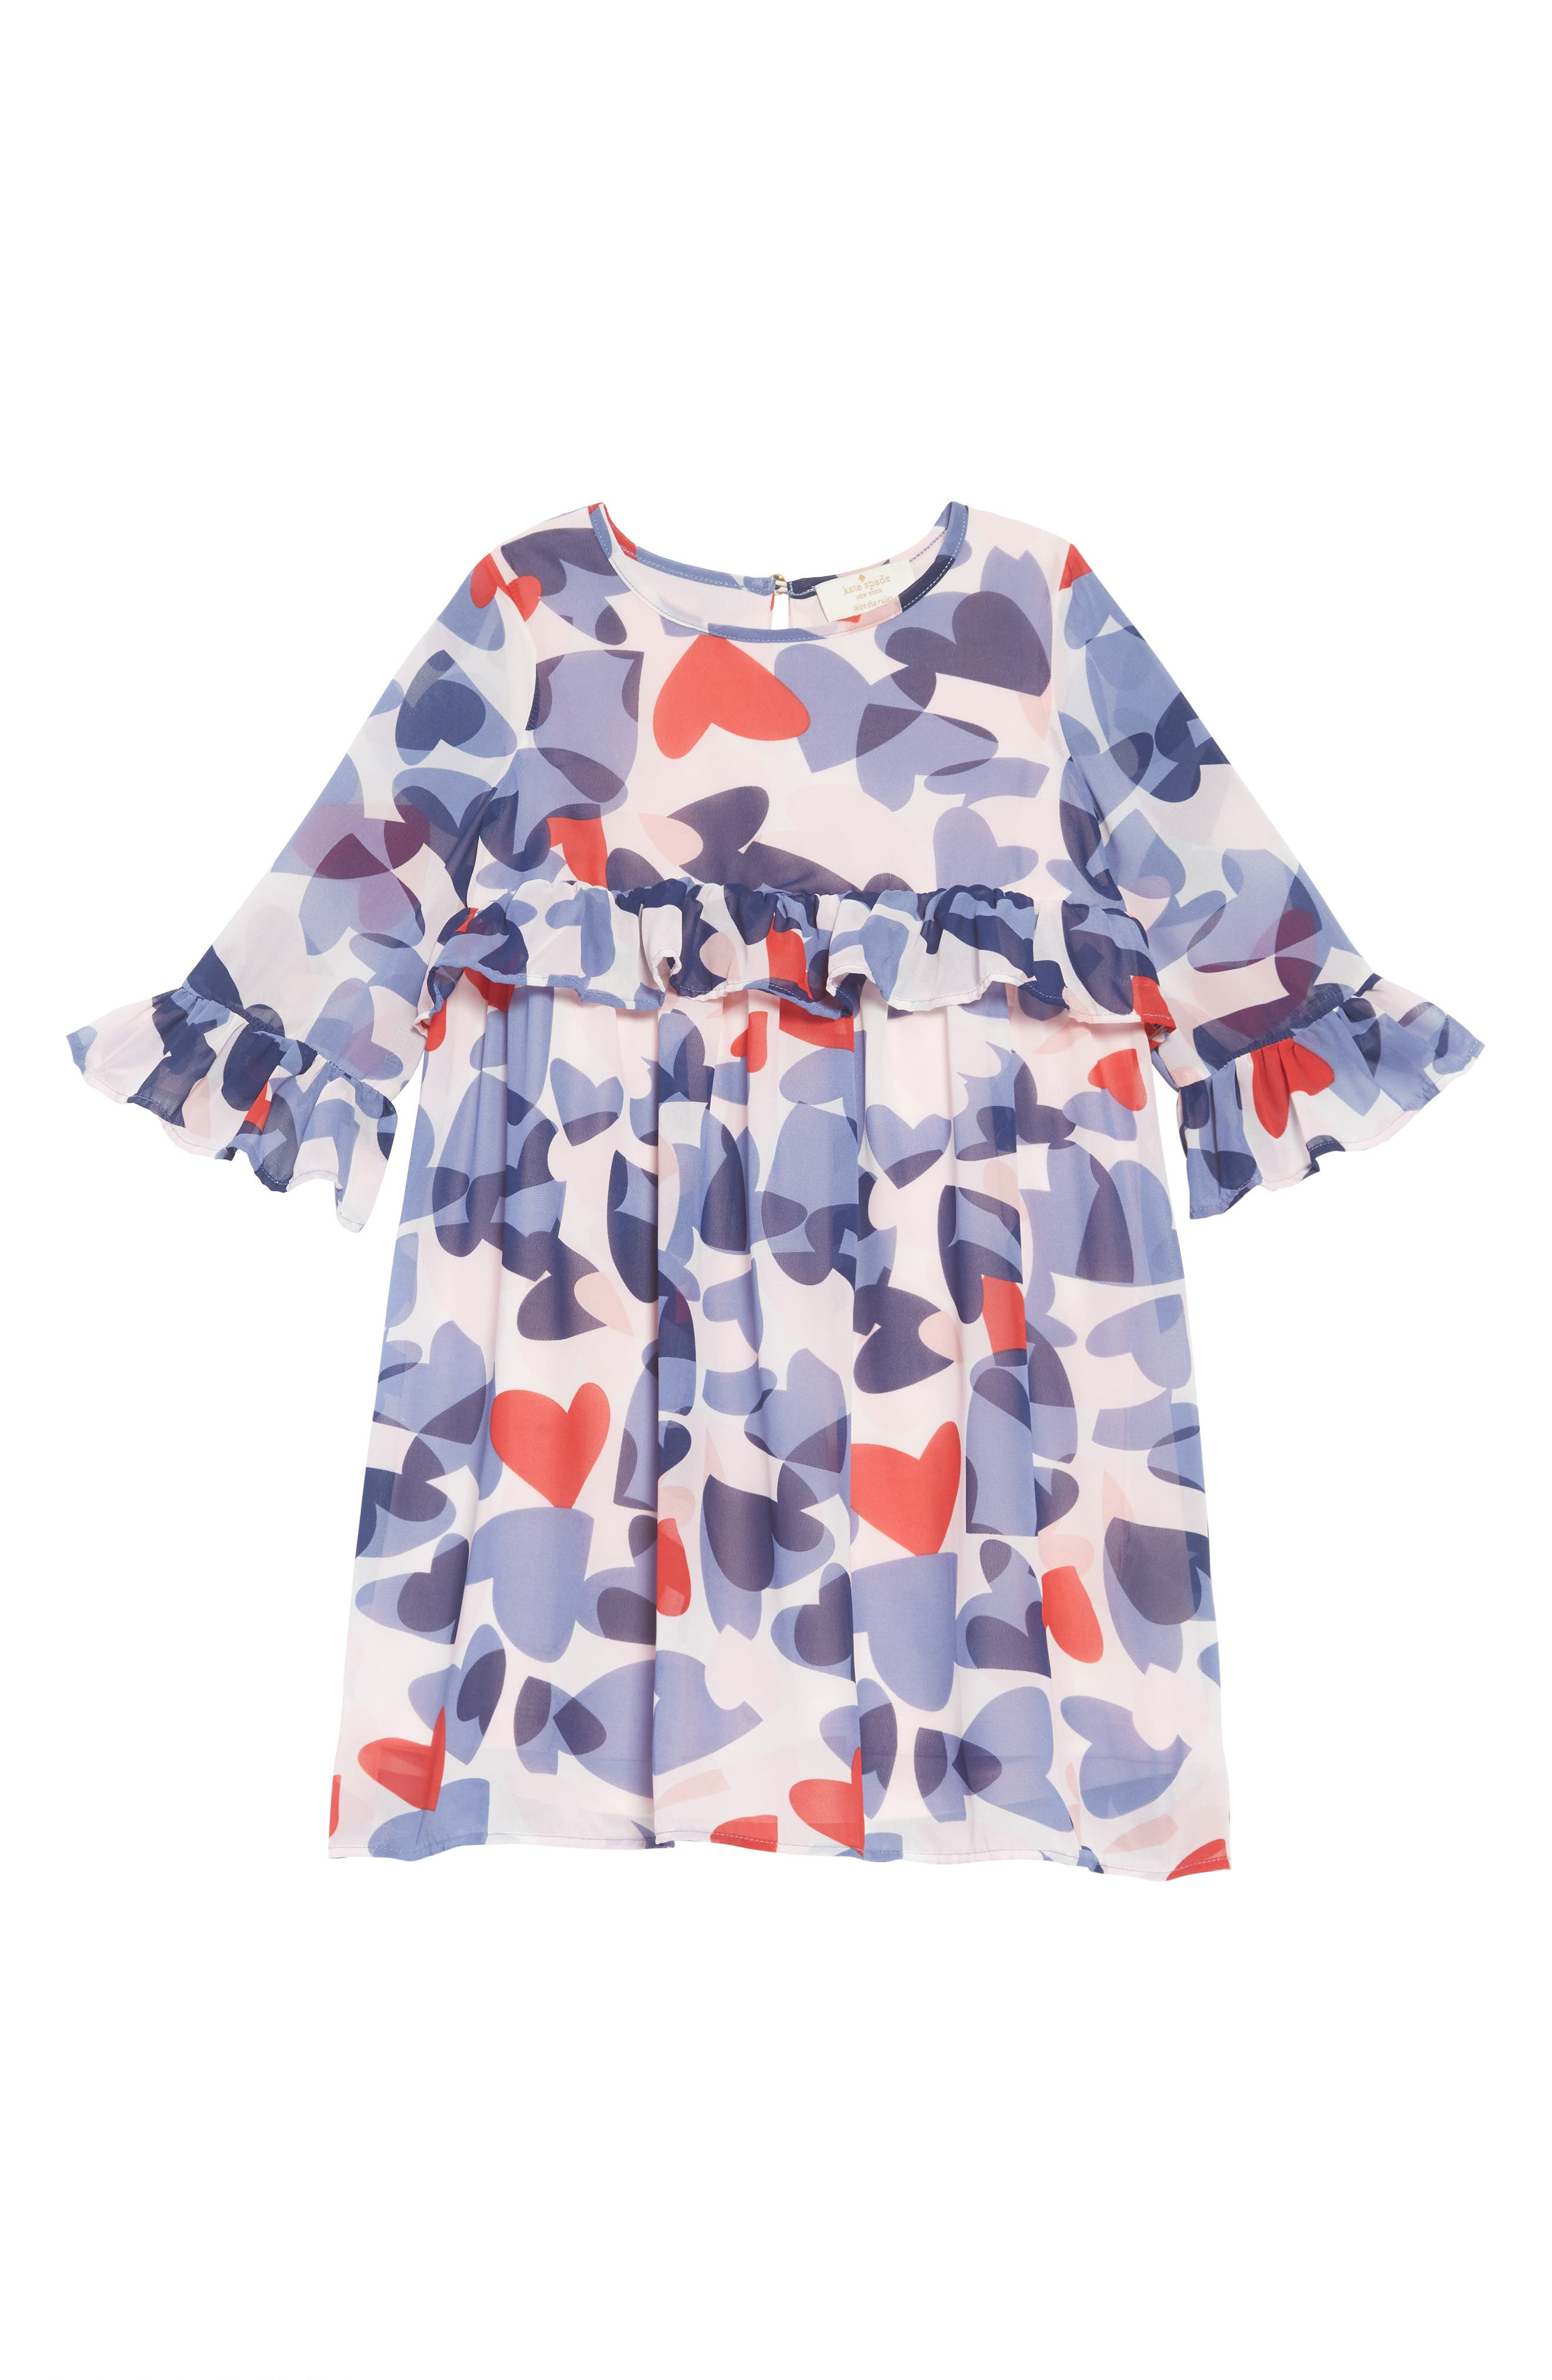 confetti hearts dress,                             Main thumbnail 1, color,                             CONFETTI HEARTS